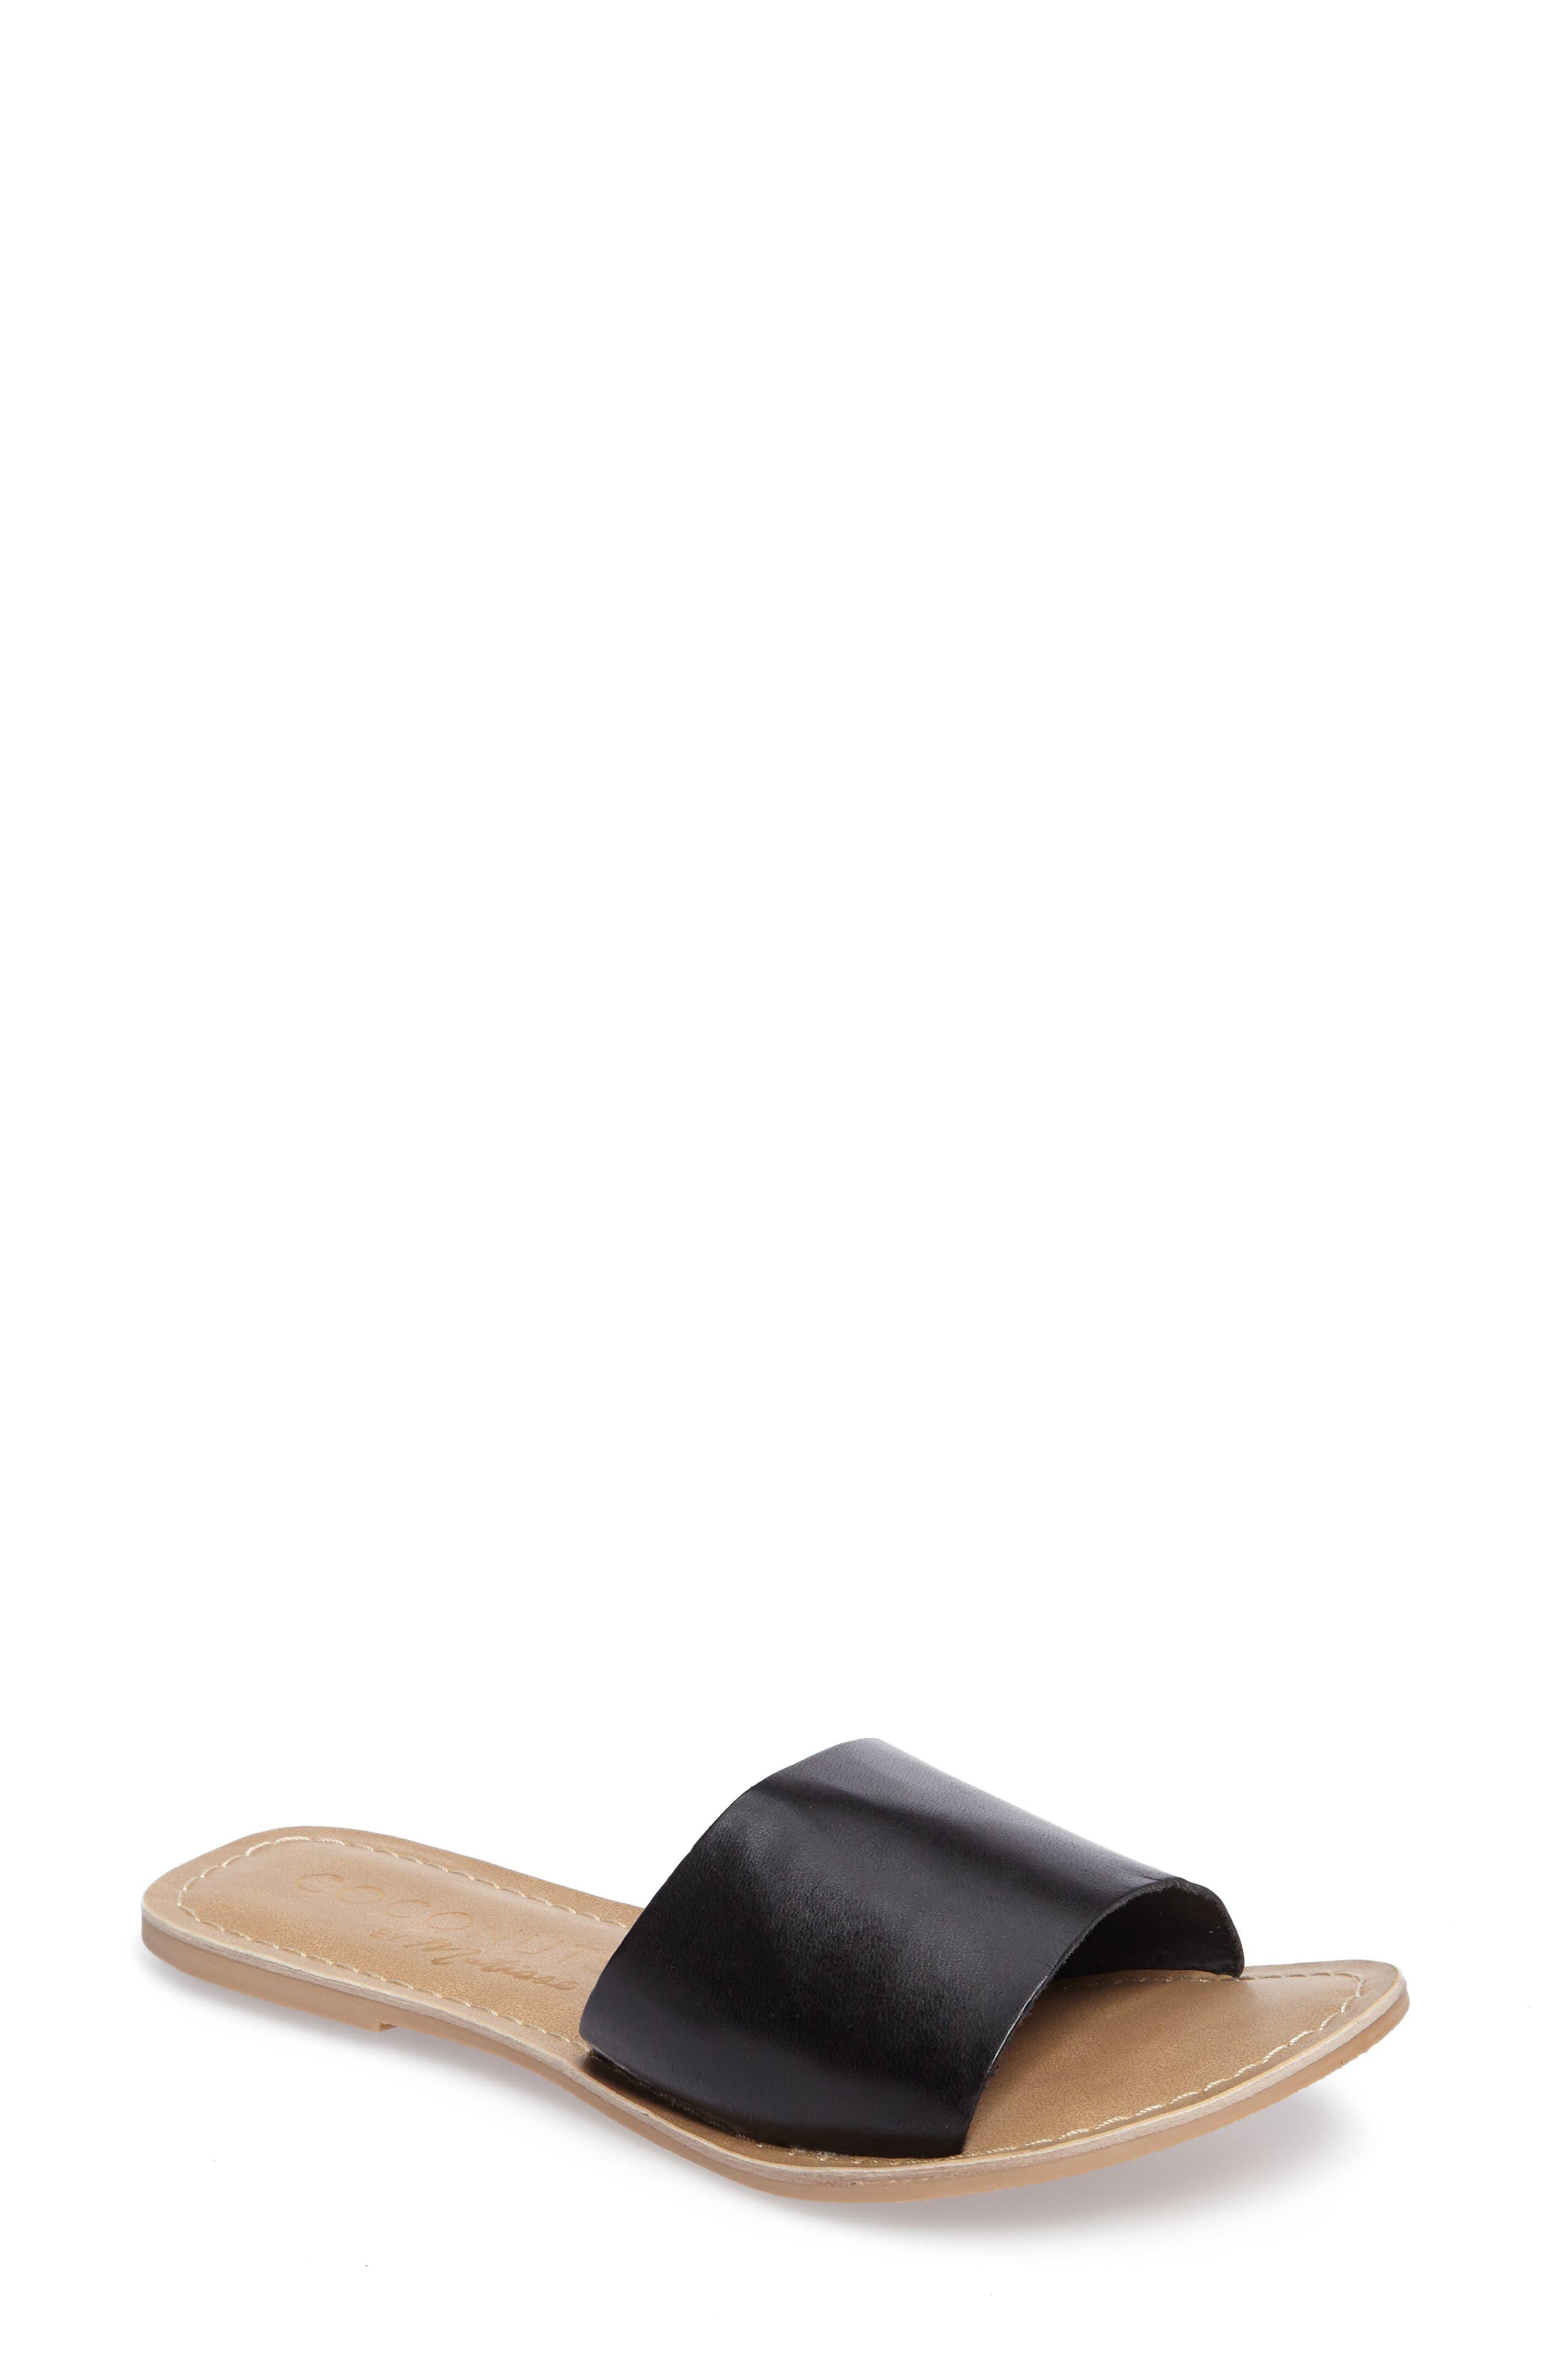 Cabana Slide Sandal,                             Main thumbnail 1, color,                             BLACK LEATHER